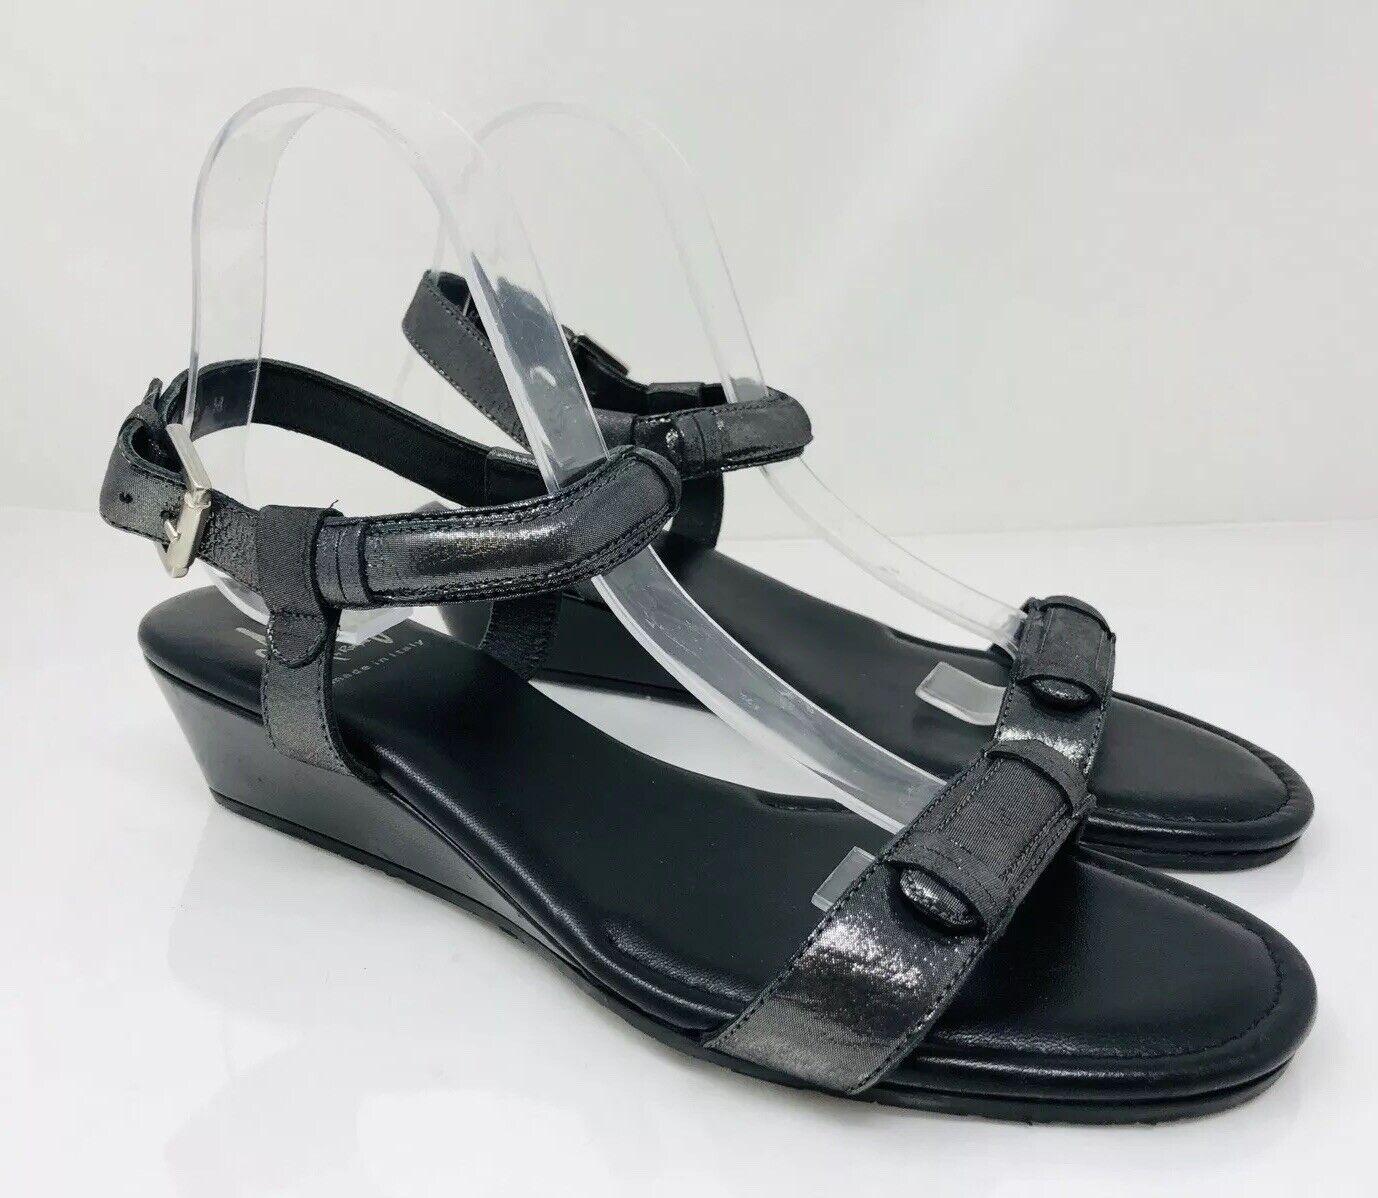 Amalfi by Rangoni Milazzo Strappy Wedge Sandal Women Size 10, MSRP